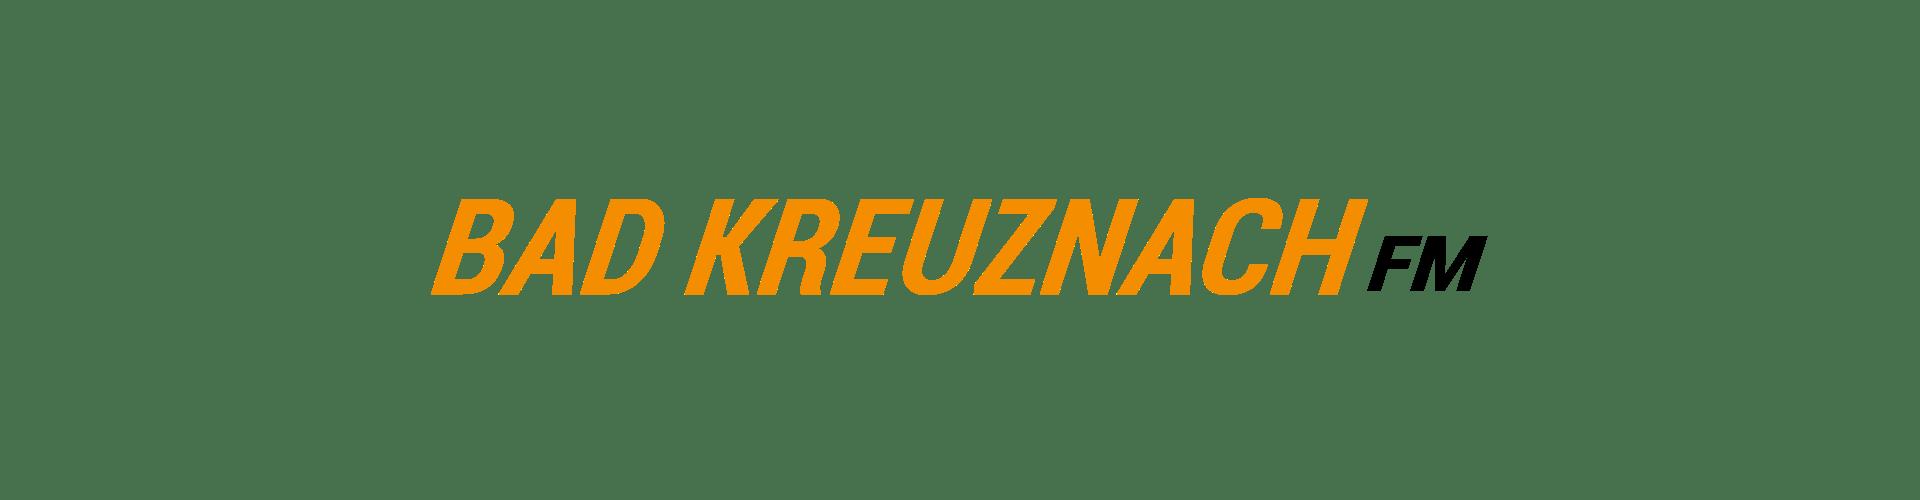 Bad Kreuznach FM